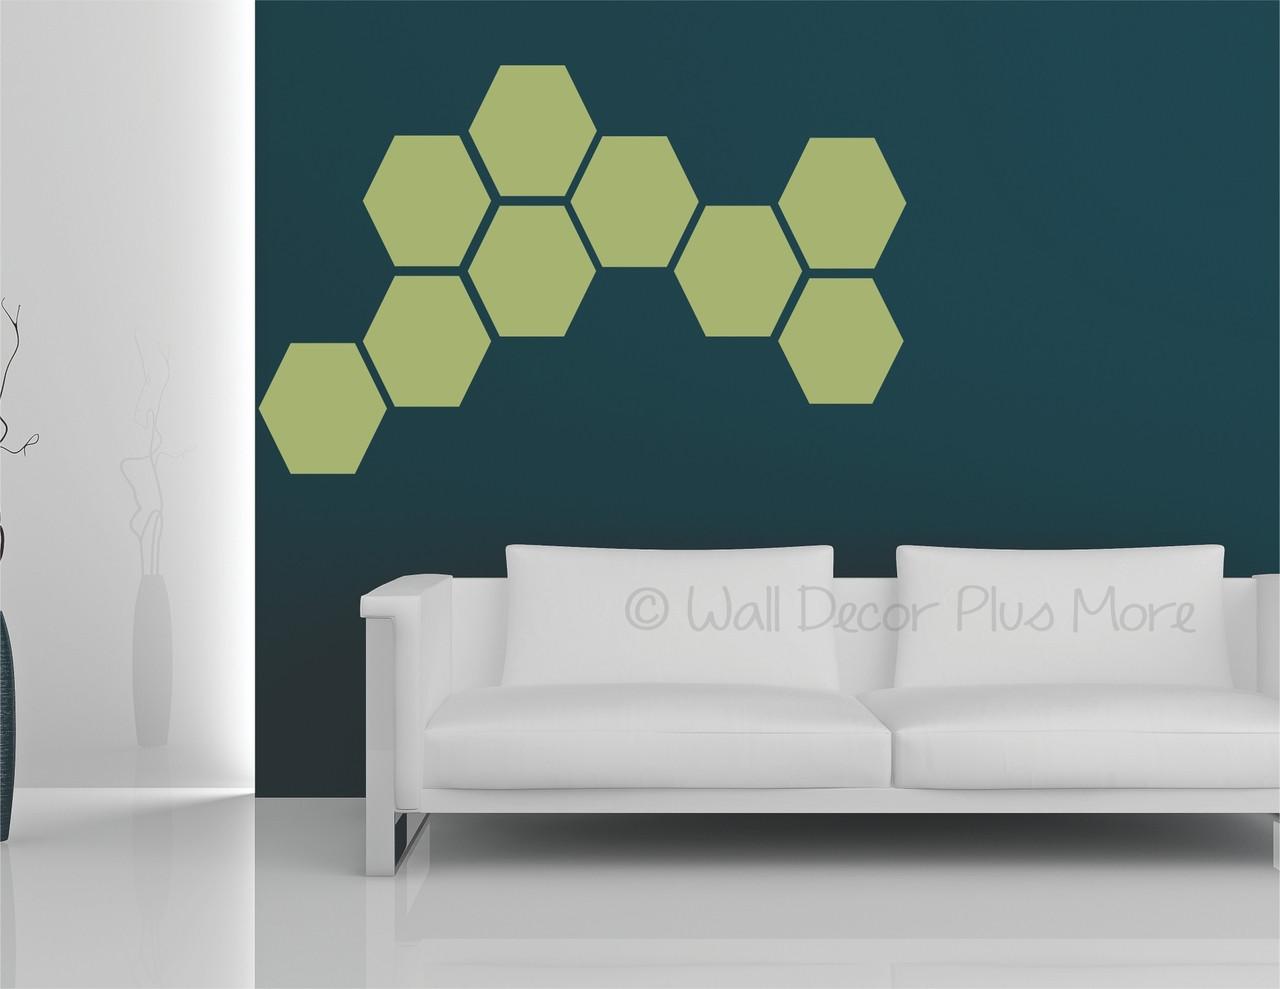 Hexagon Wall Stickers Shapes Vinyl Decals Honeycomb Art Dcor 9inch